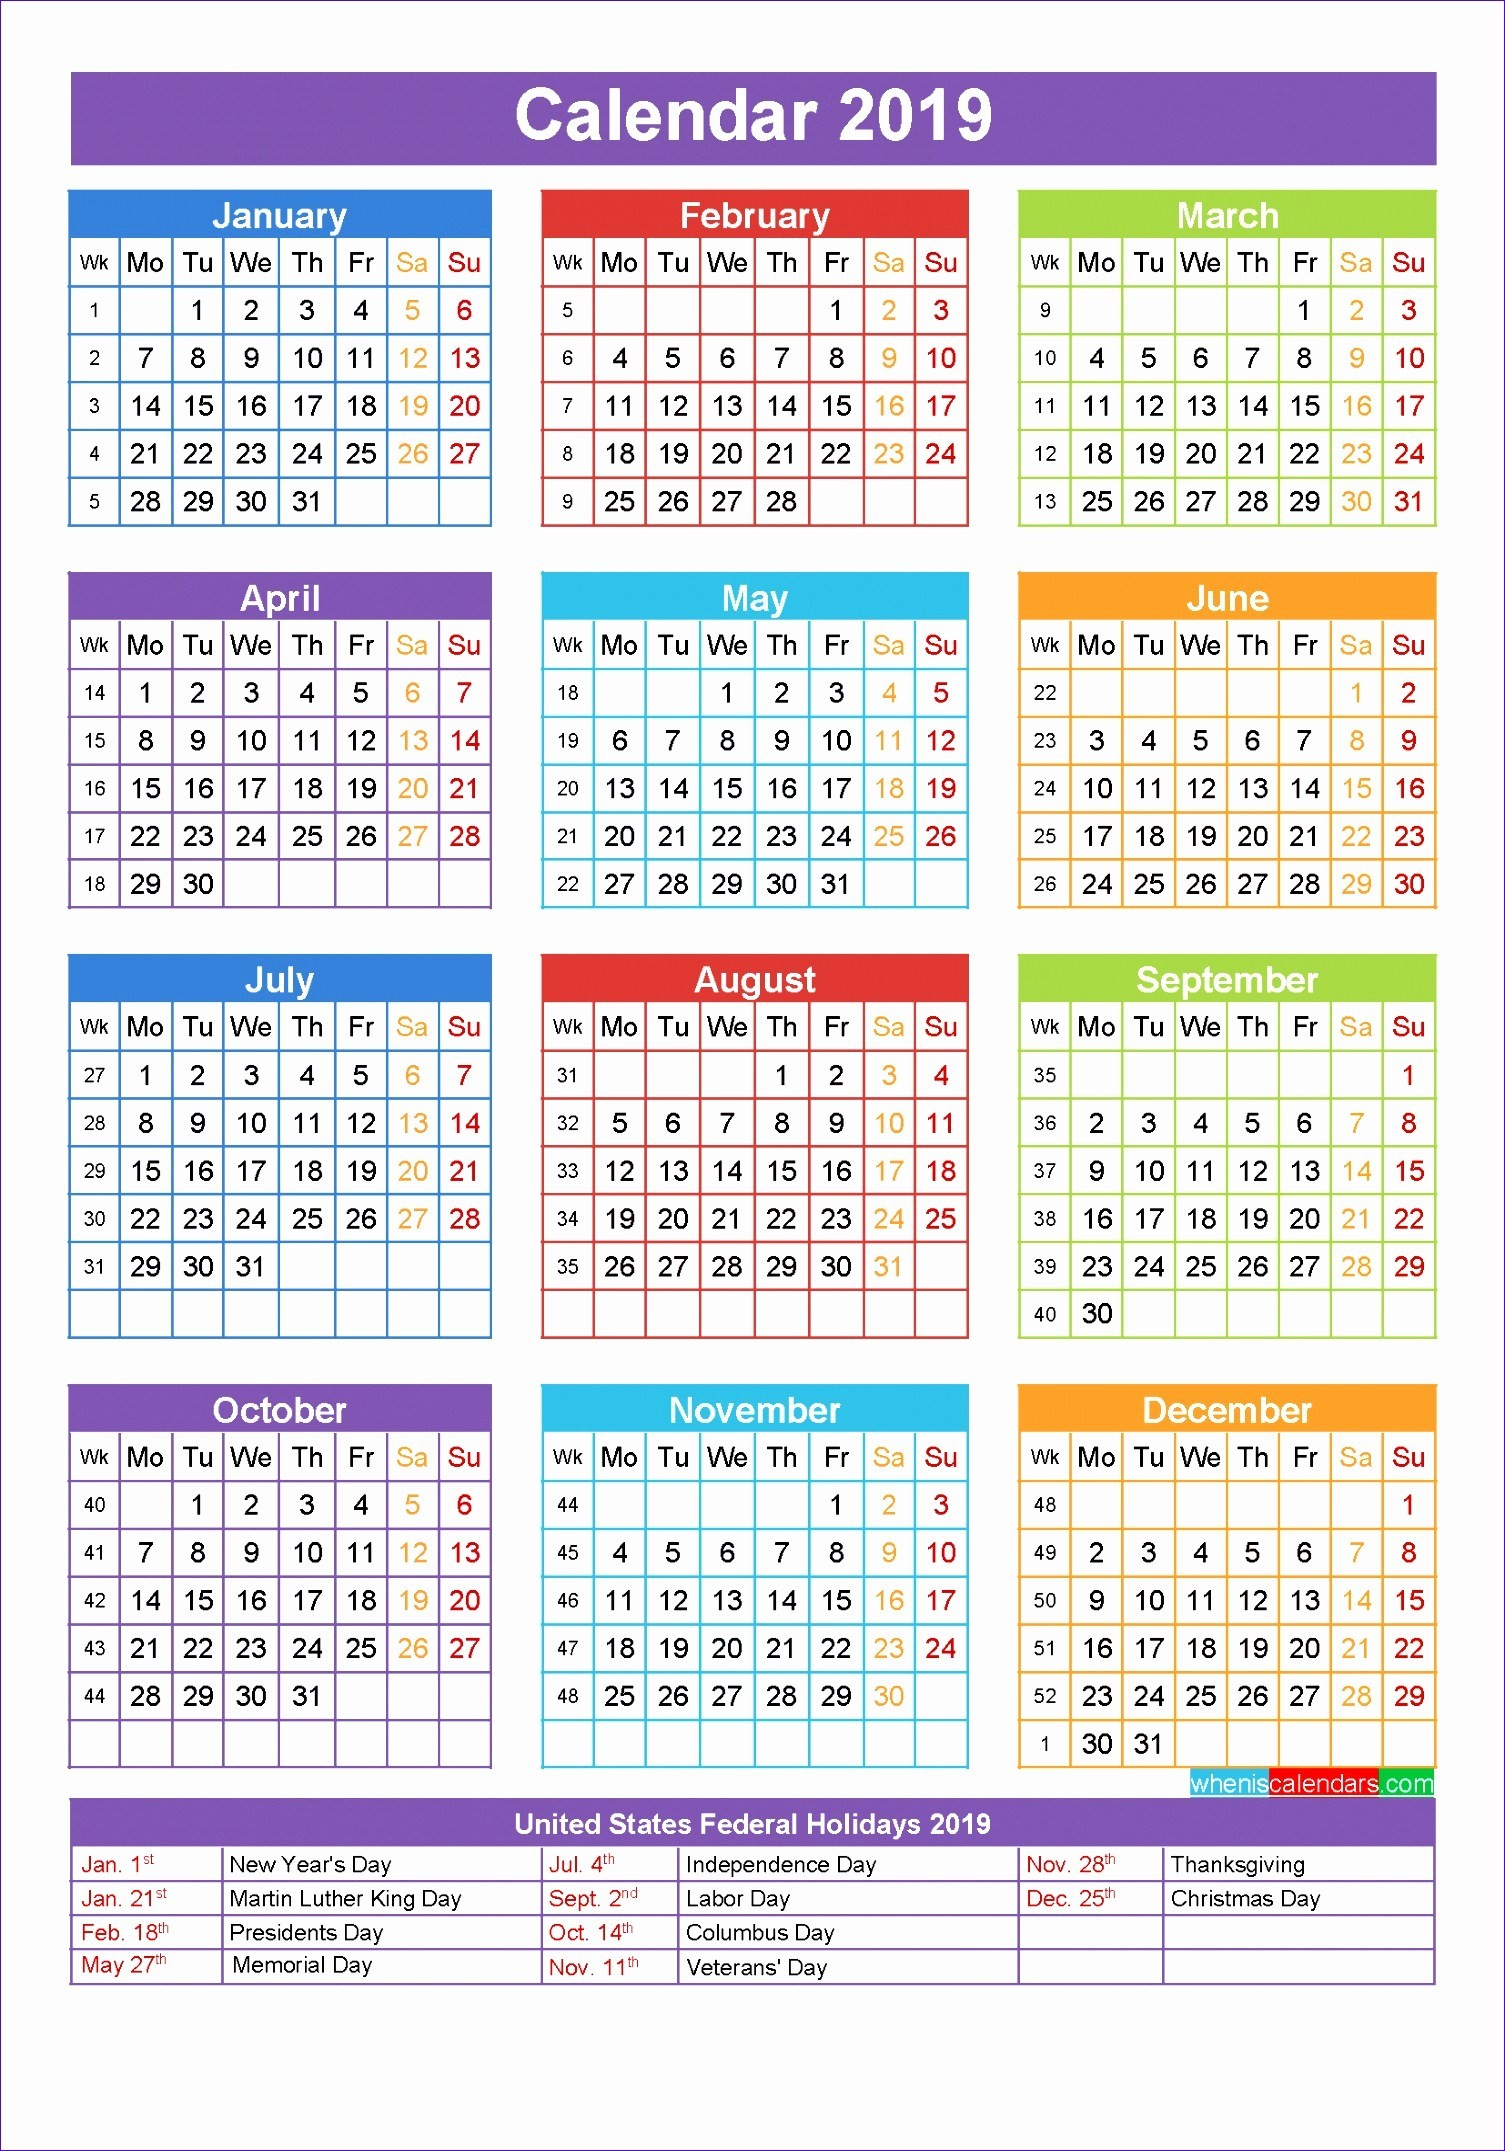 Calendarlabs 2018 Excel Indesign Calendar Template 2019 15 Free